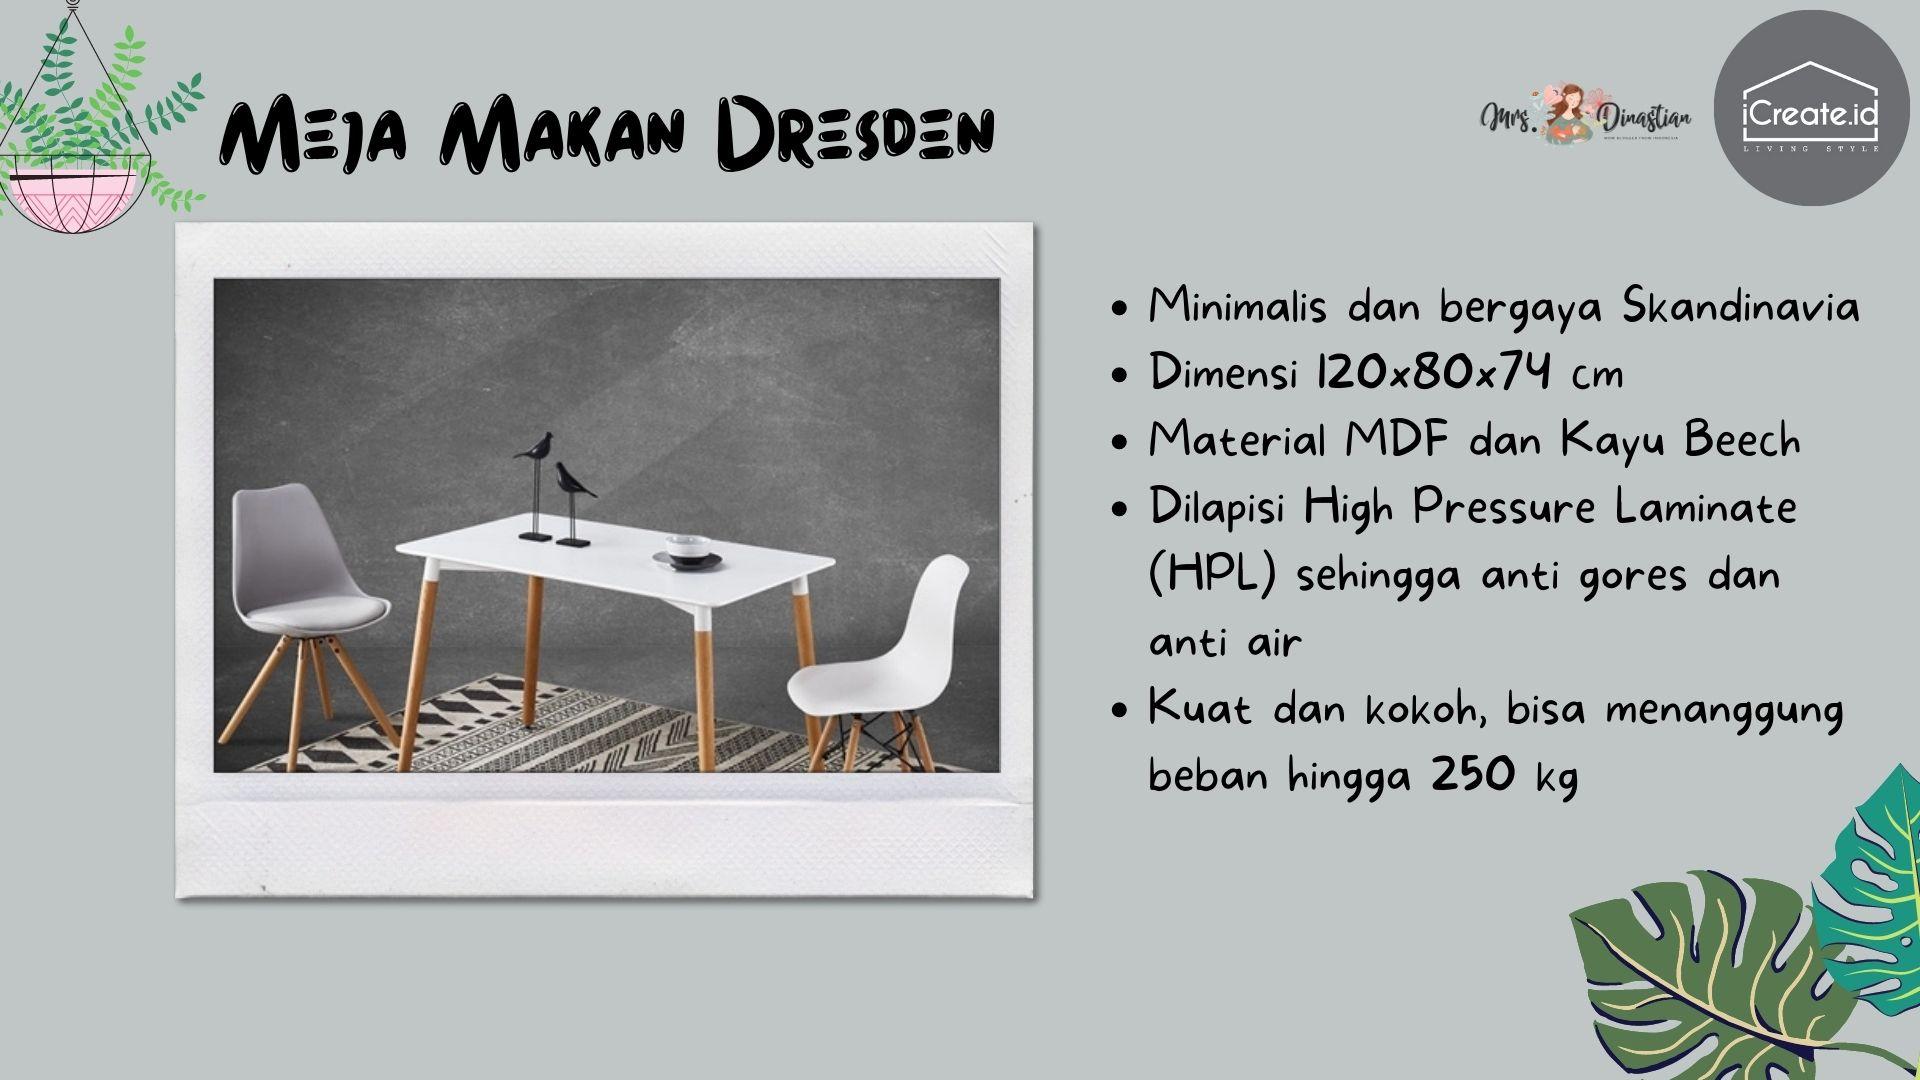 Dresden Meja Makan Minimalis iCreate.id